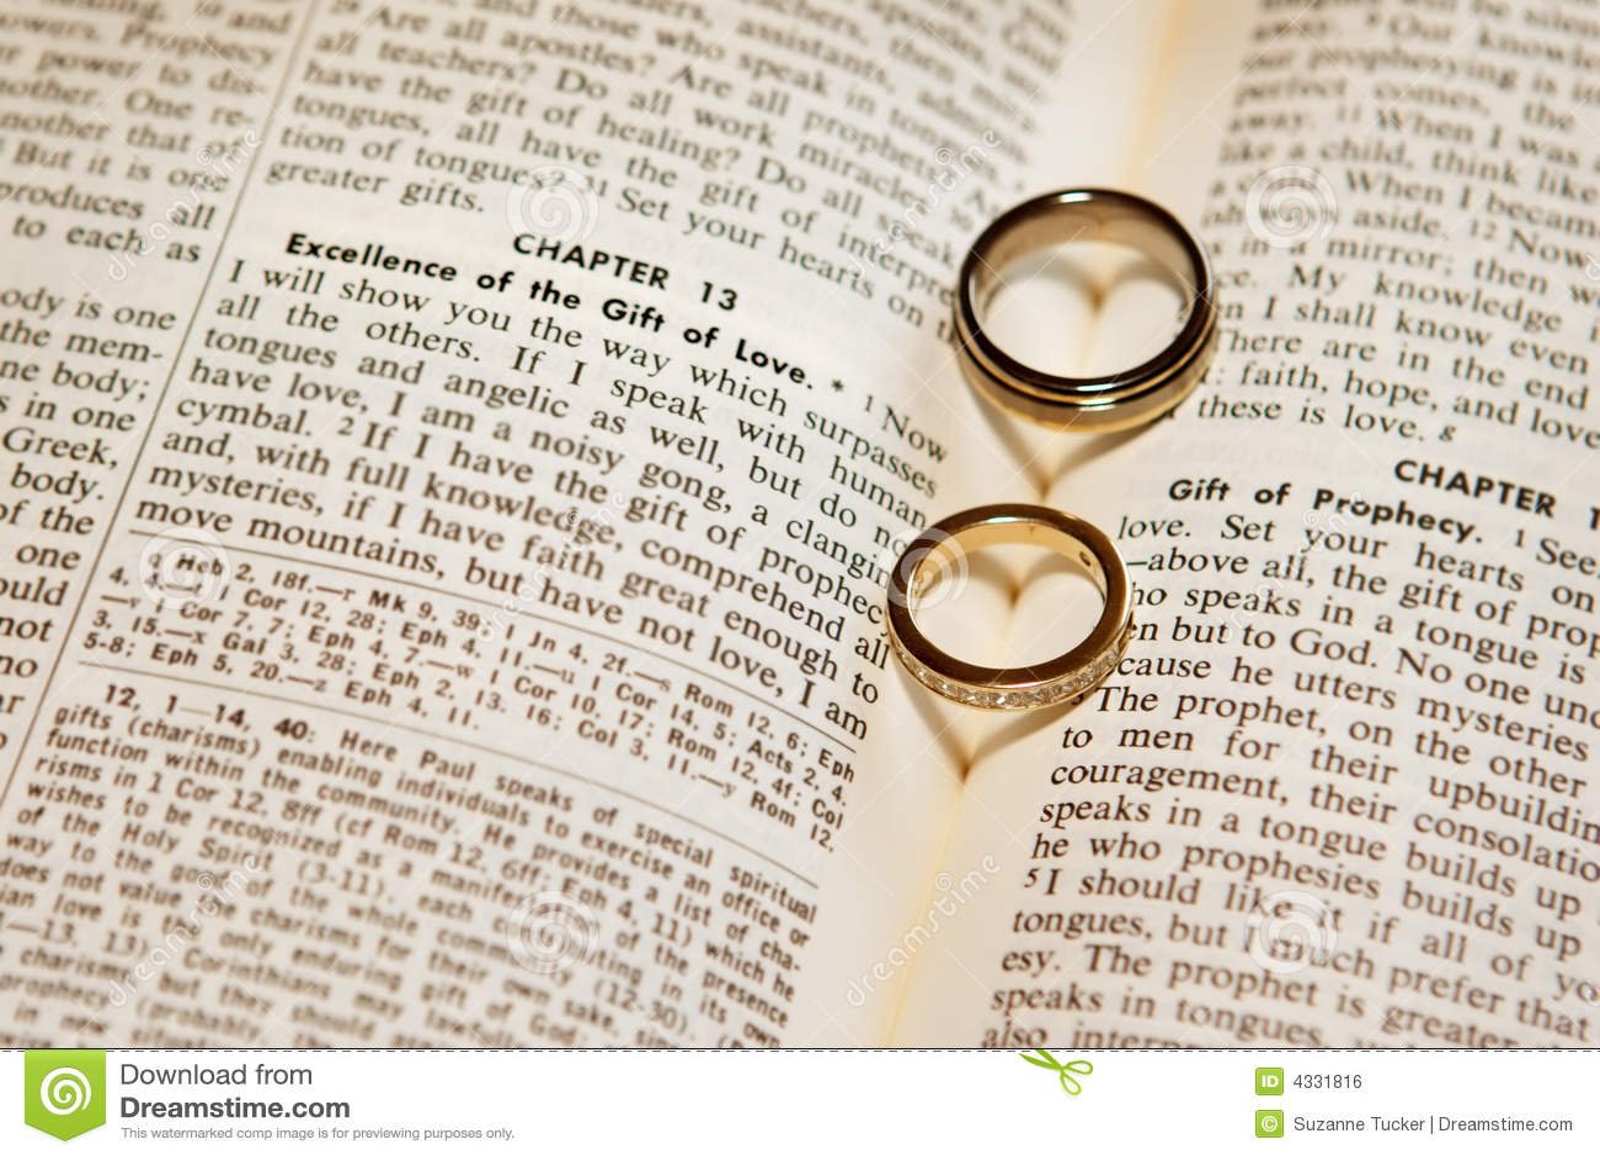 Matrimonio En La Biblia Cristiana : Anillos de bodas en una biblia foto archivo imagen